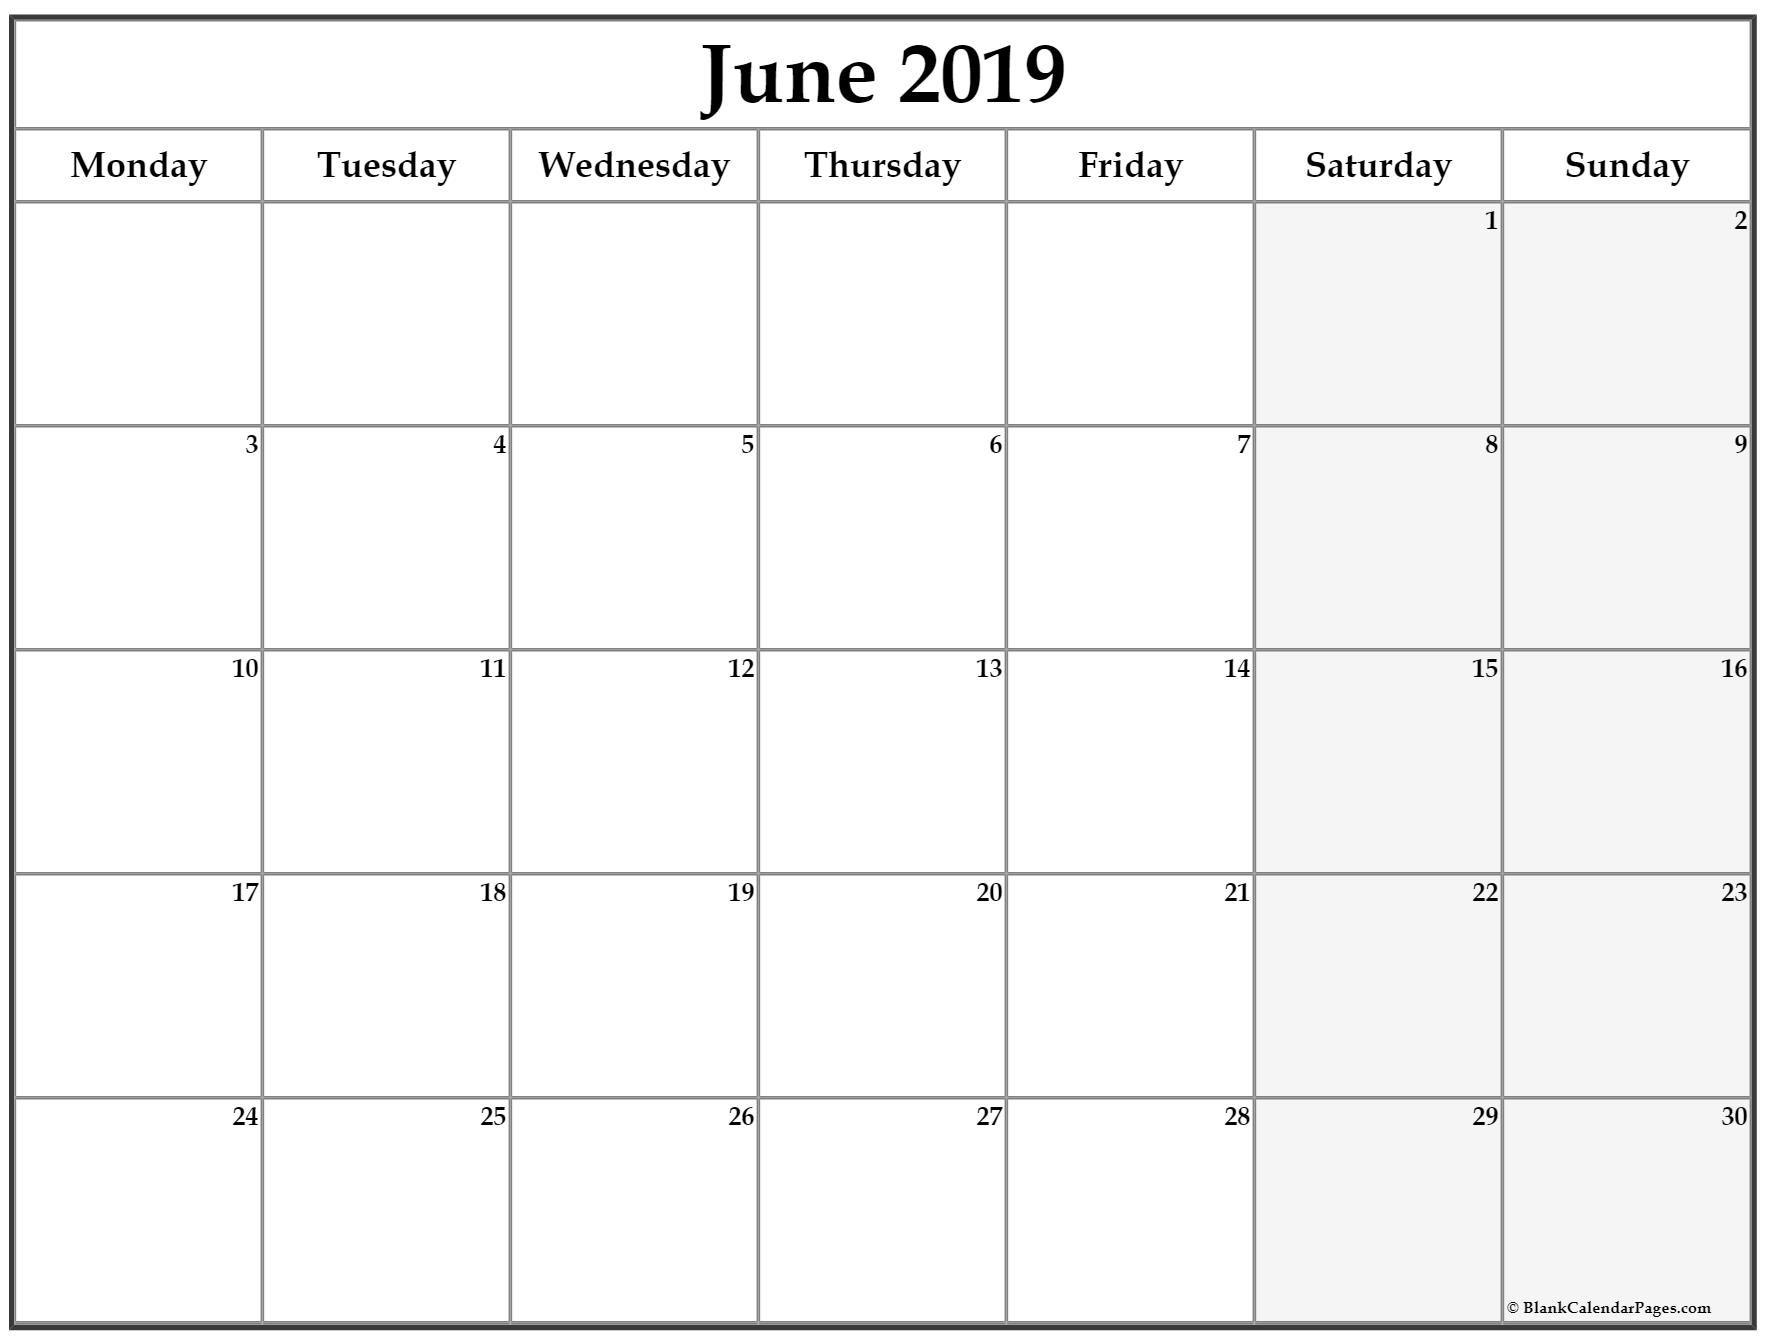 June 2019 Monday Calendar. Monday To Sunday | Calendar for Printable Monday To Sunday 2020 Calendar